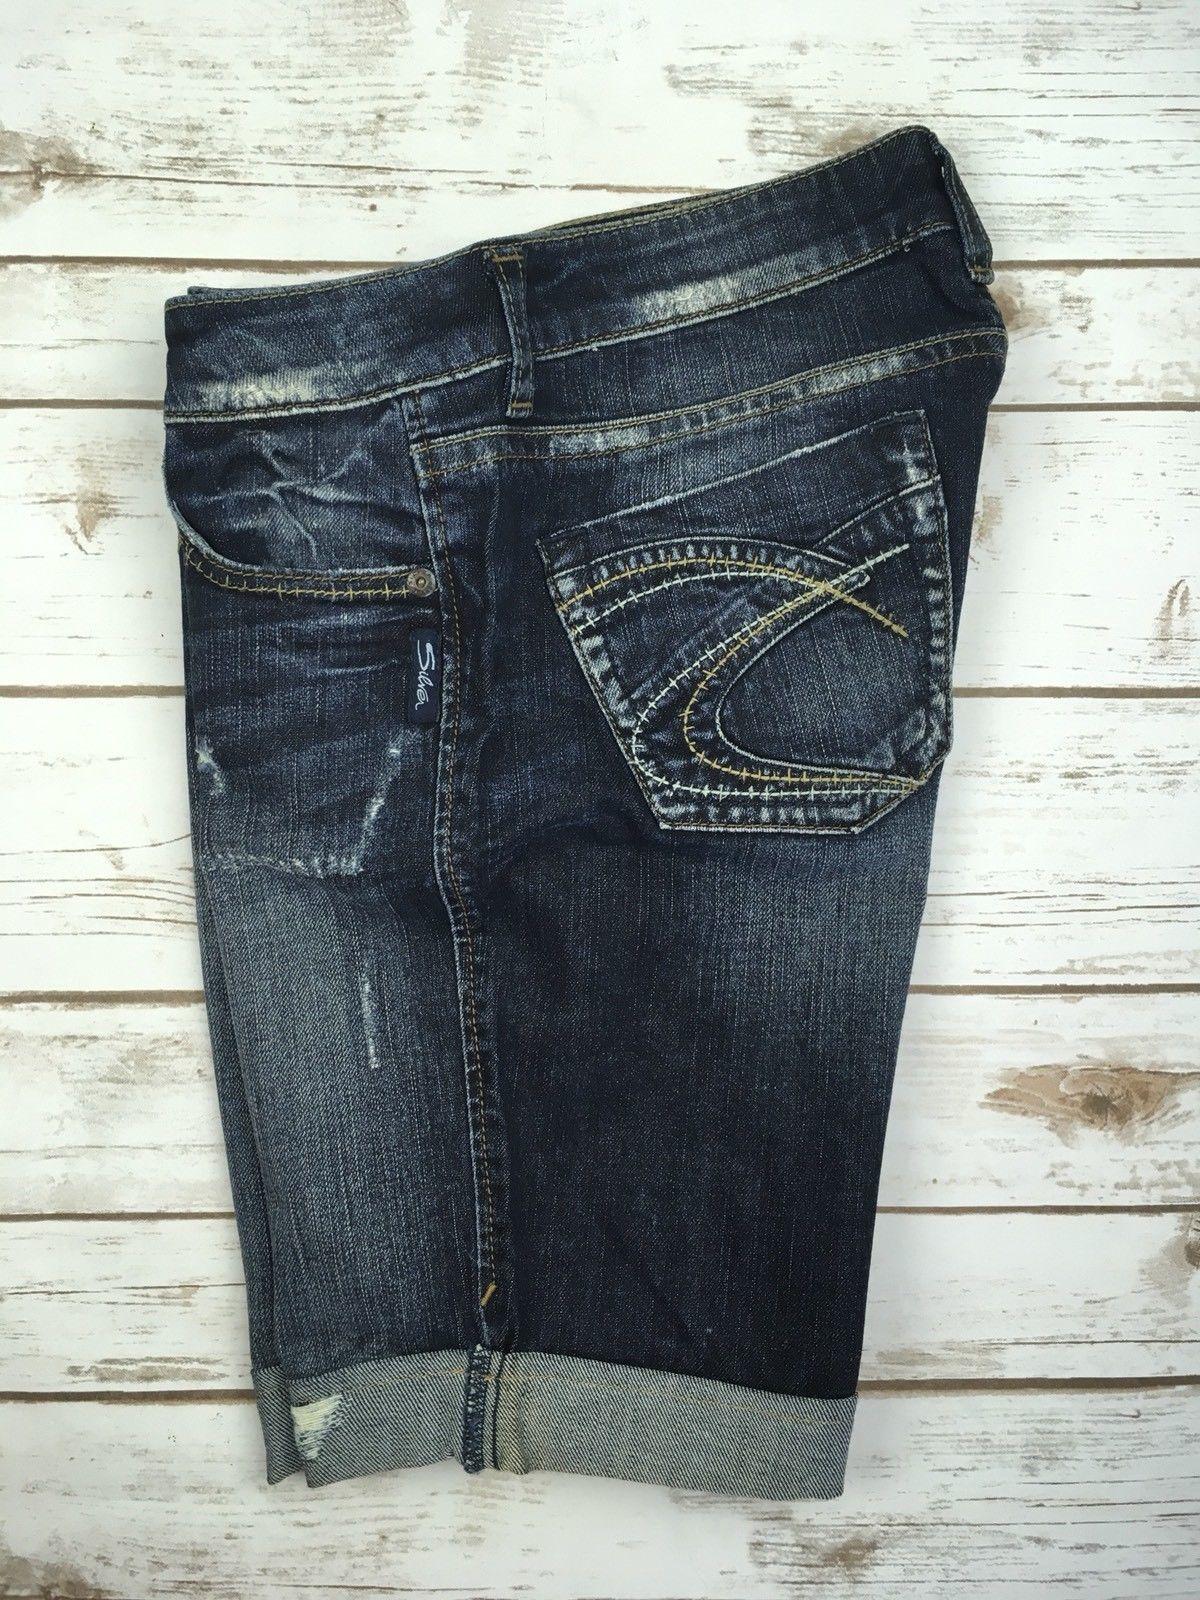 SILVER JEANS SHORTS Buckle Mid Rise Lola Denim Jean Stretch Cuffed Shorts 29 New